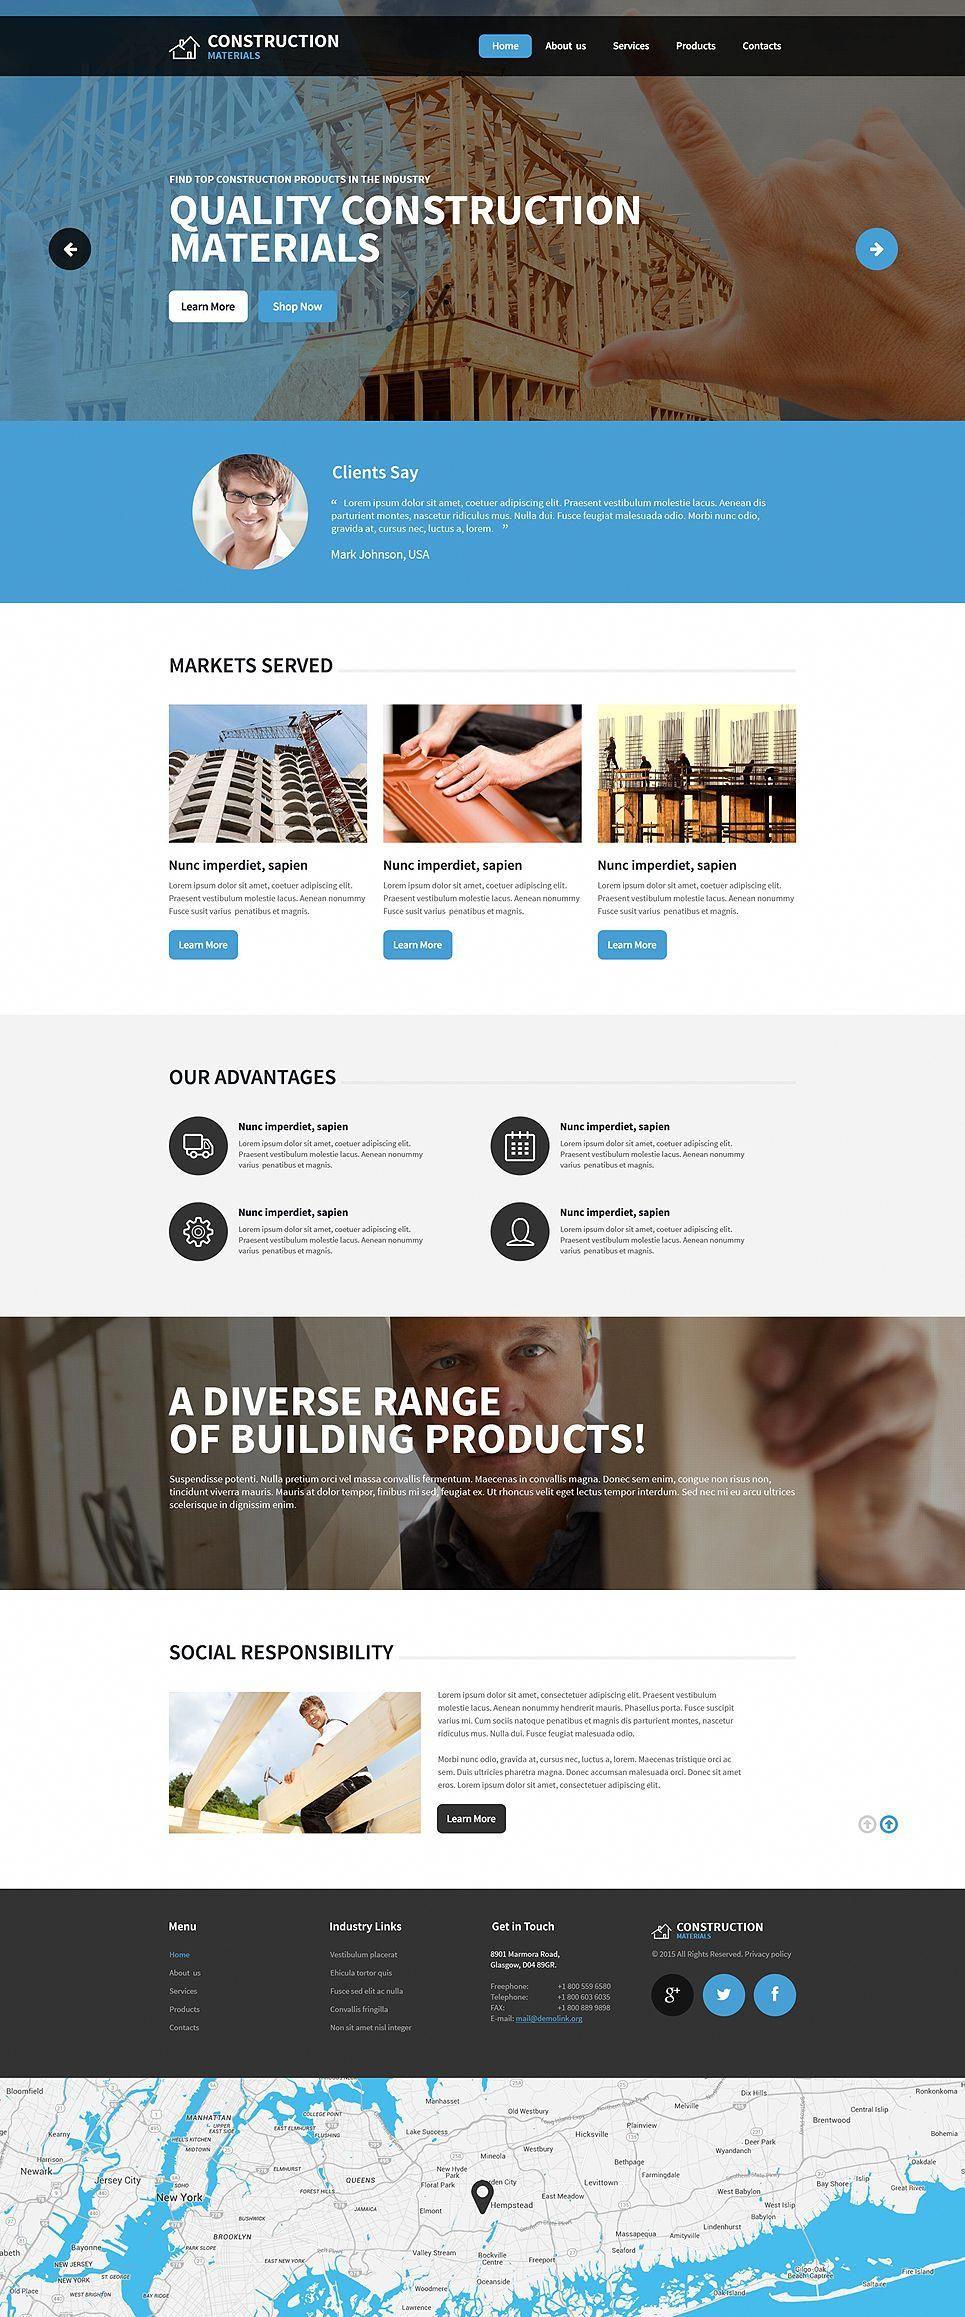 Construction Company Responsive Website Template Company Construction Responsive Webd Website Template Responsive Website Template Material Design Website